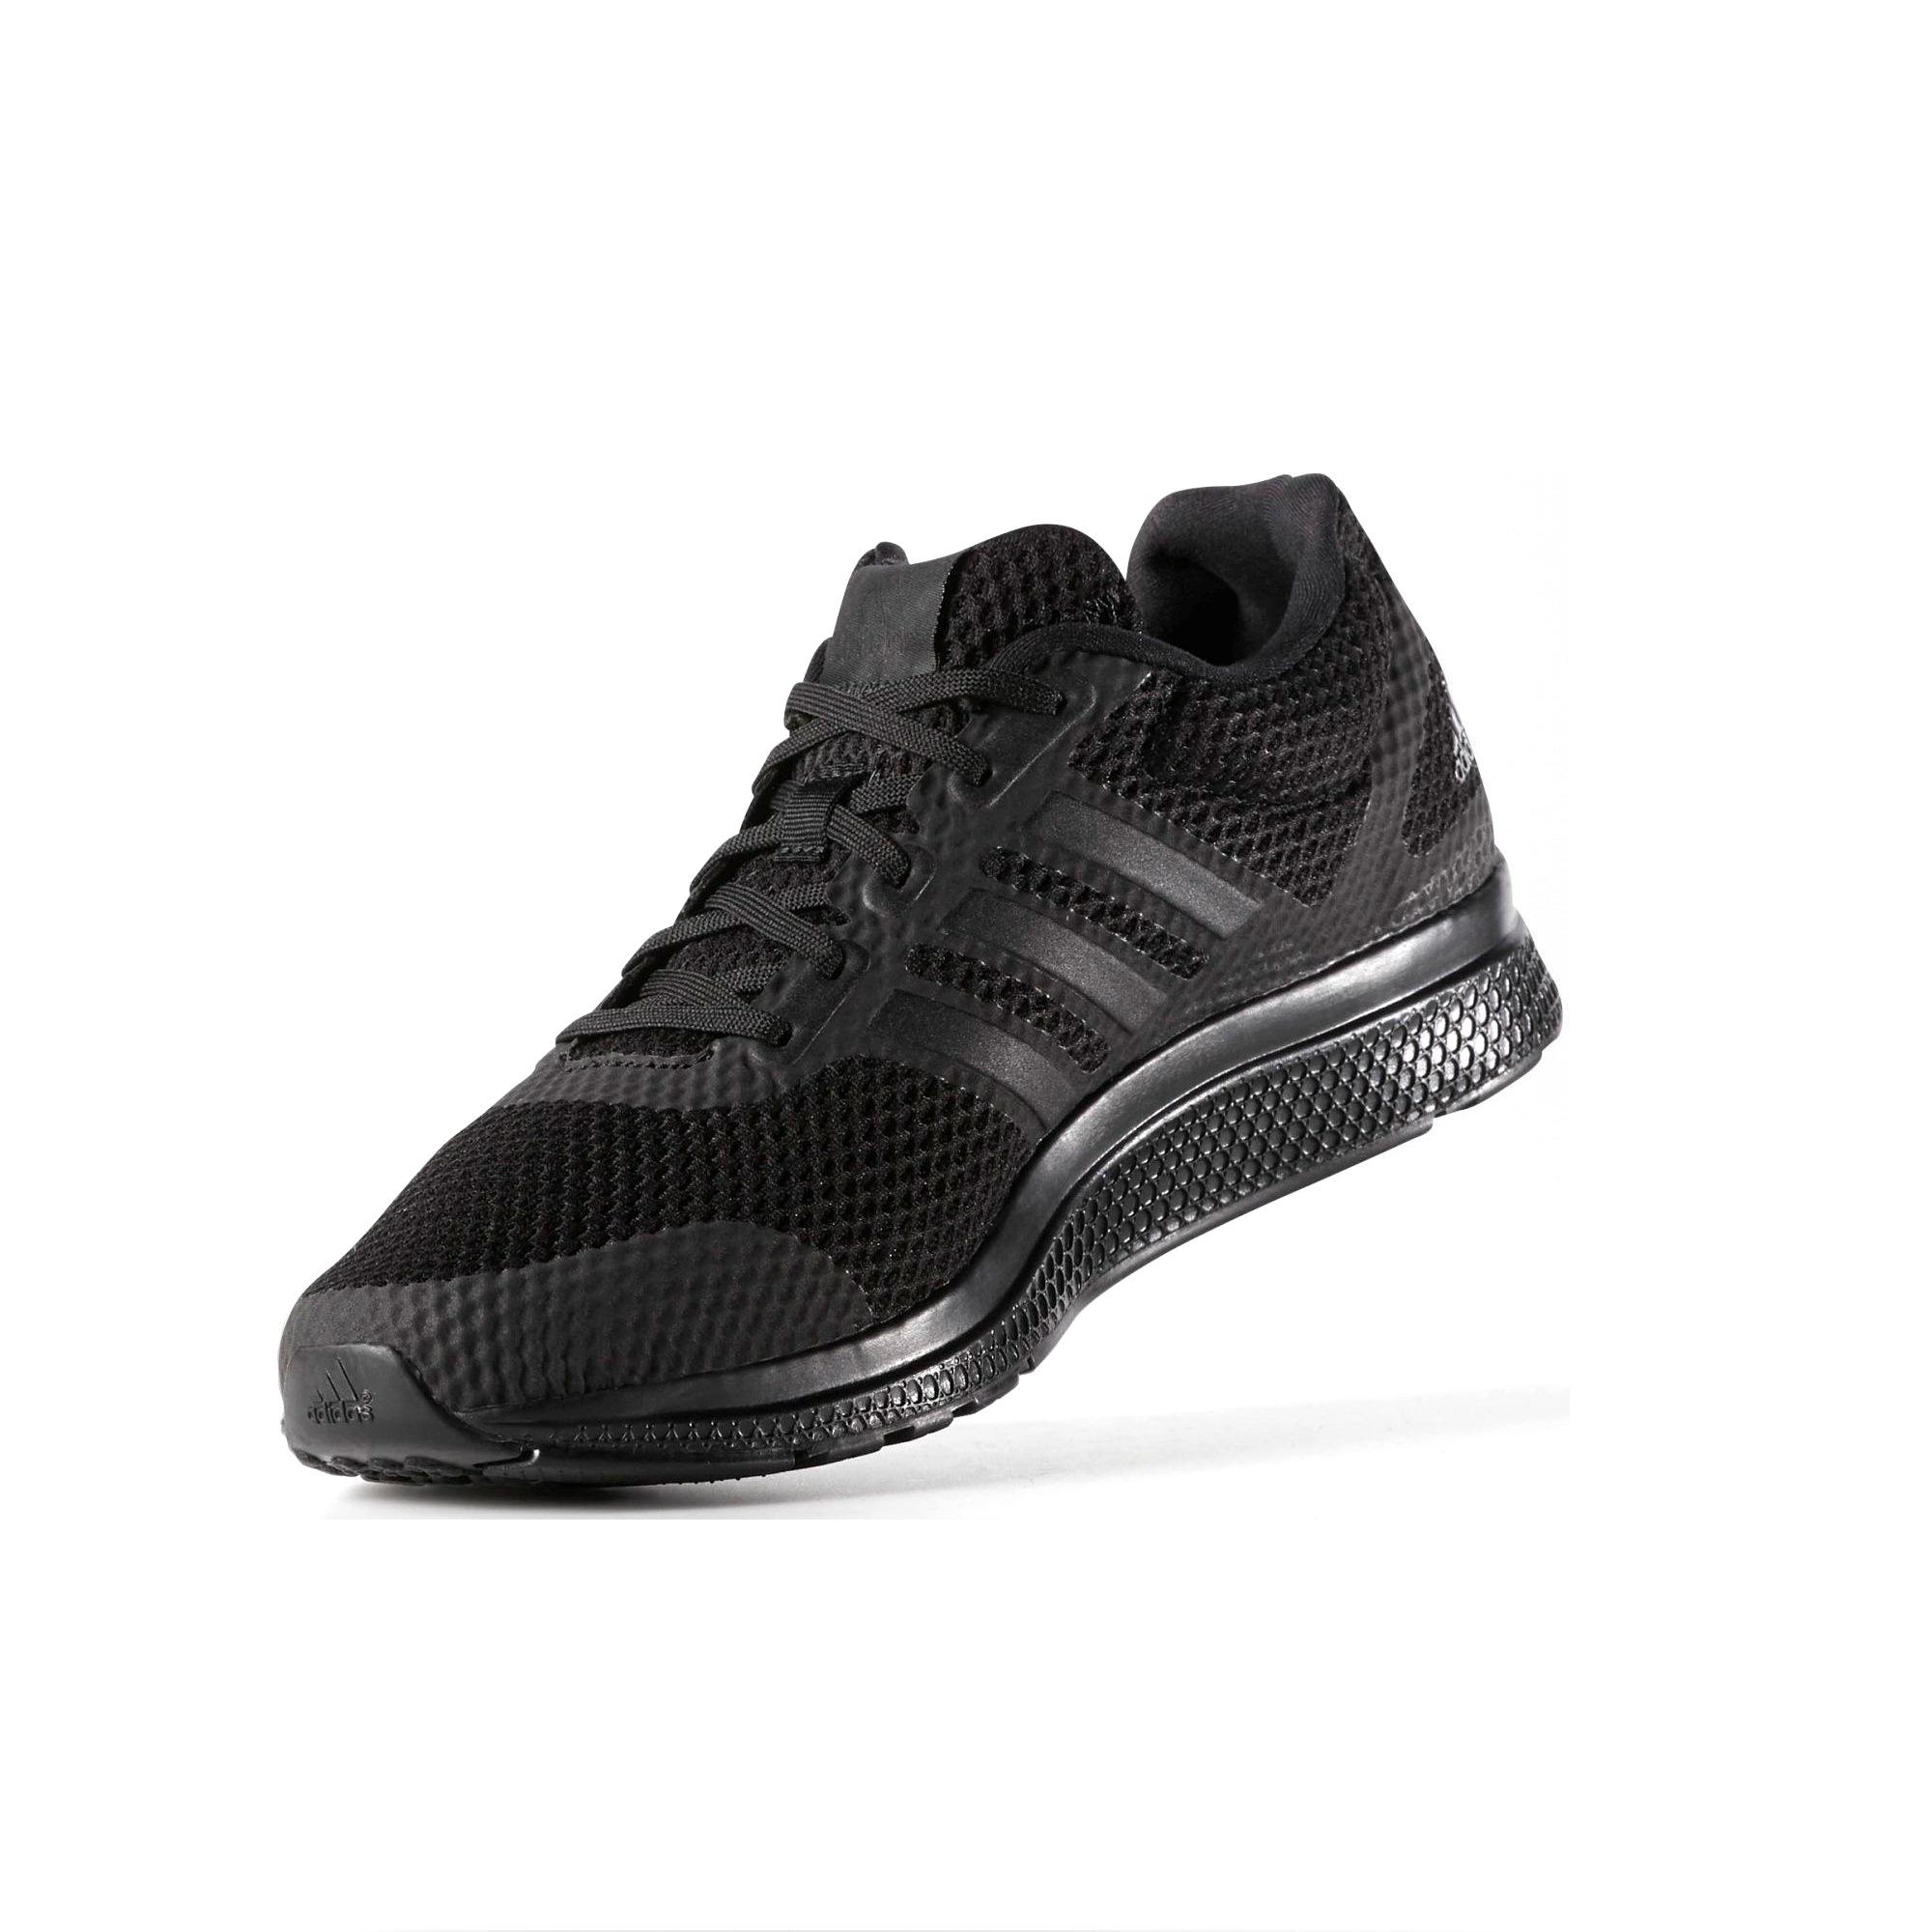 bd06fbd11 Adidas-Men-039-s-Running-Mana-Bounce-Shoes thumbnail